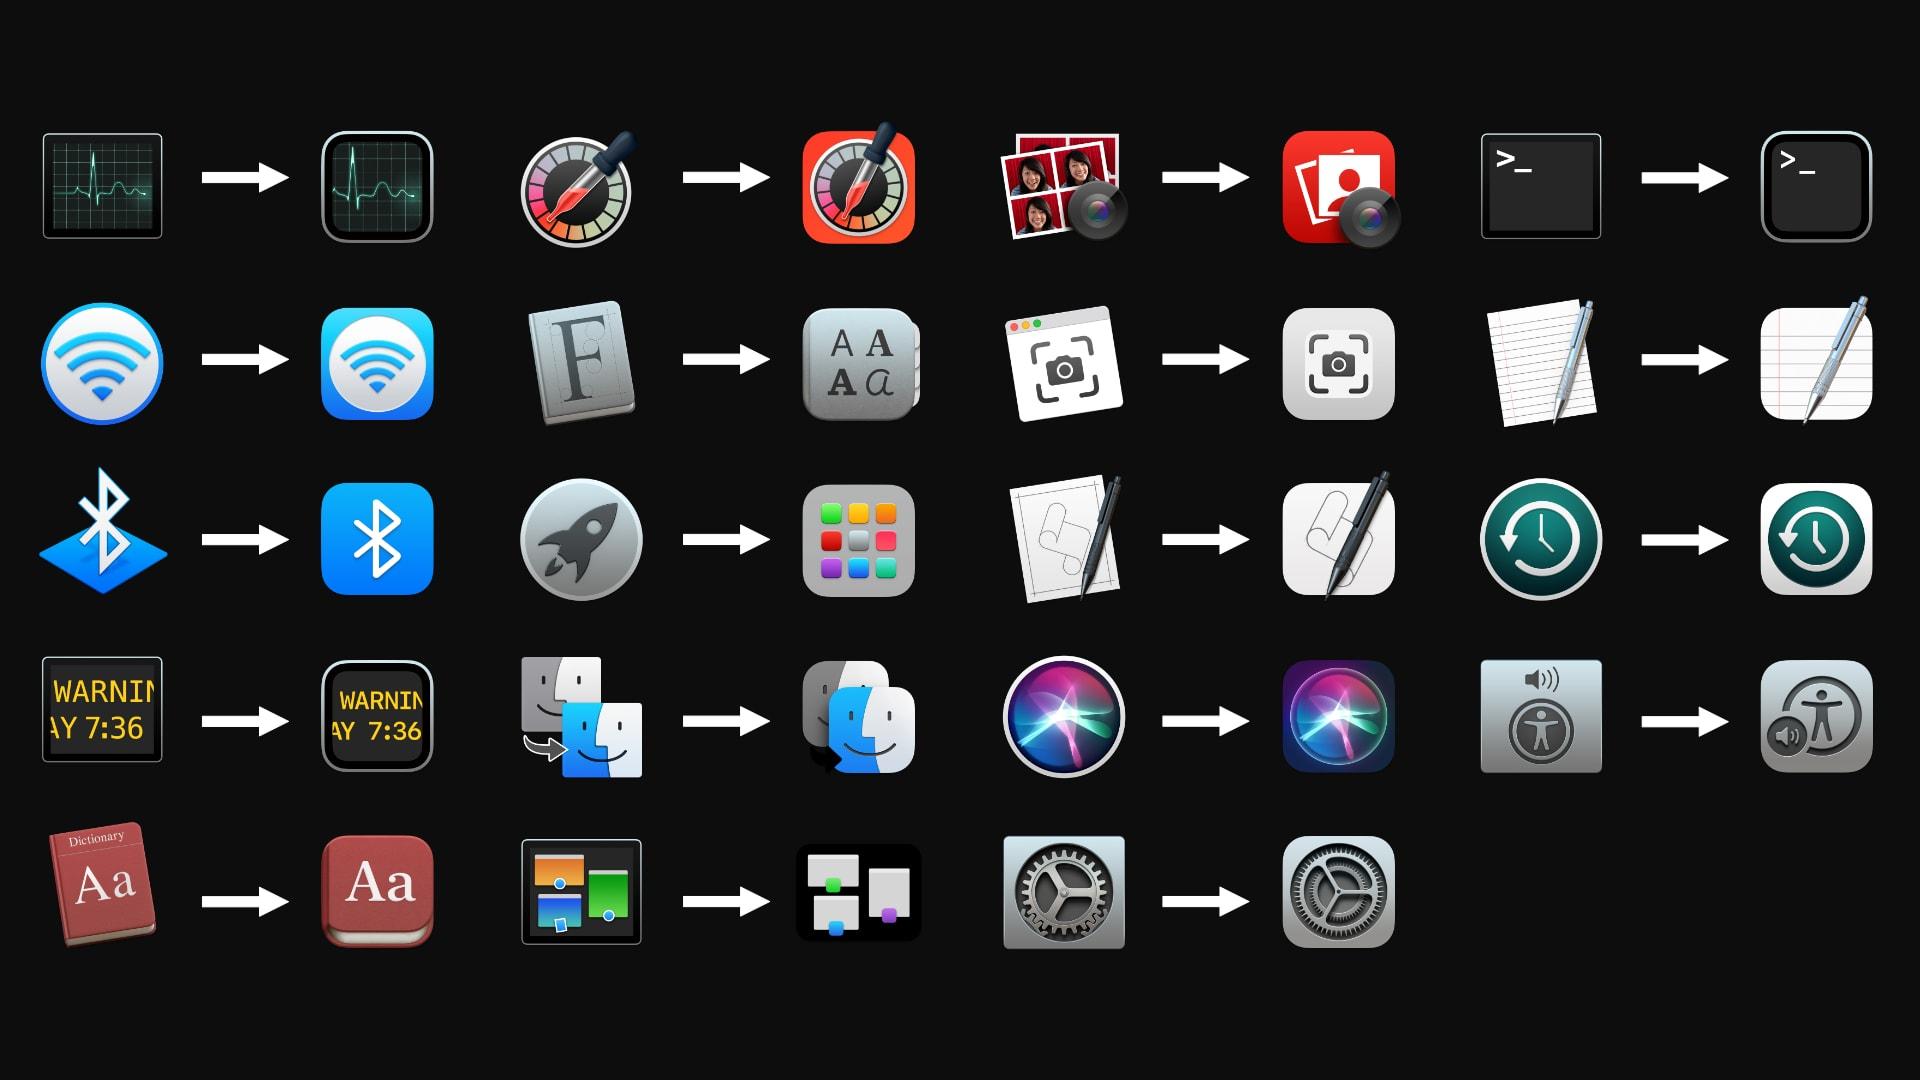 Big Sur vs. Catalina: App icons 3